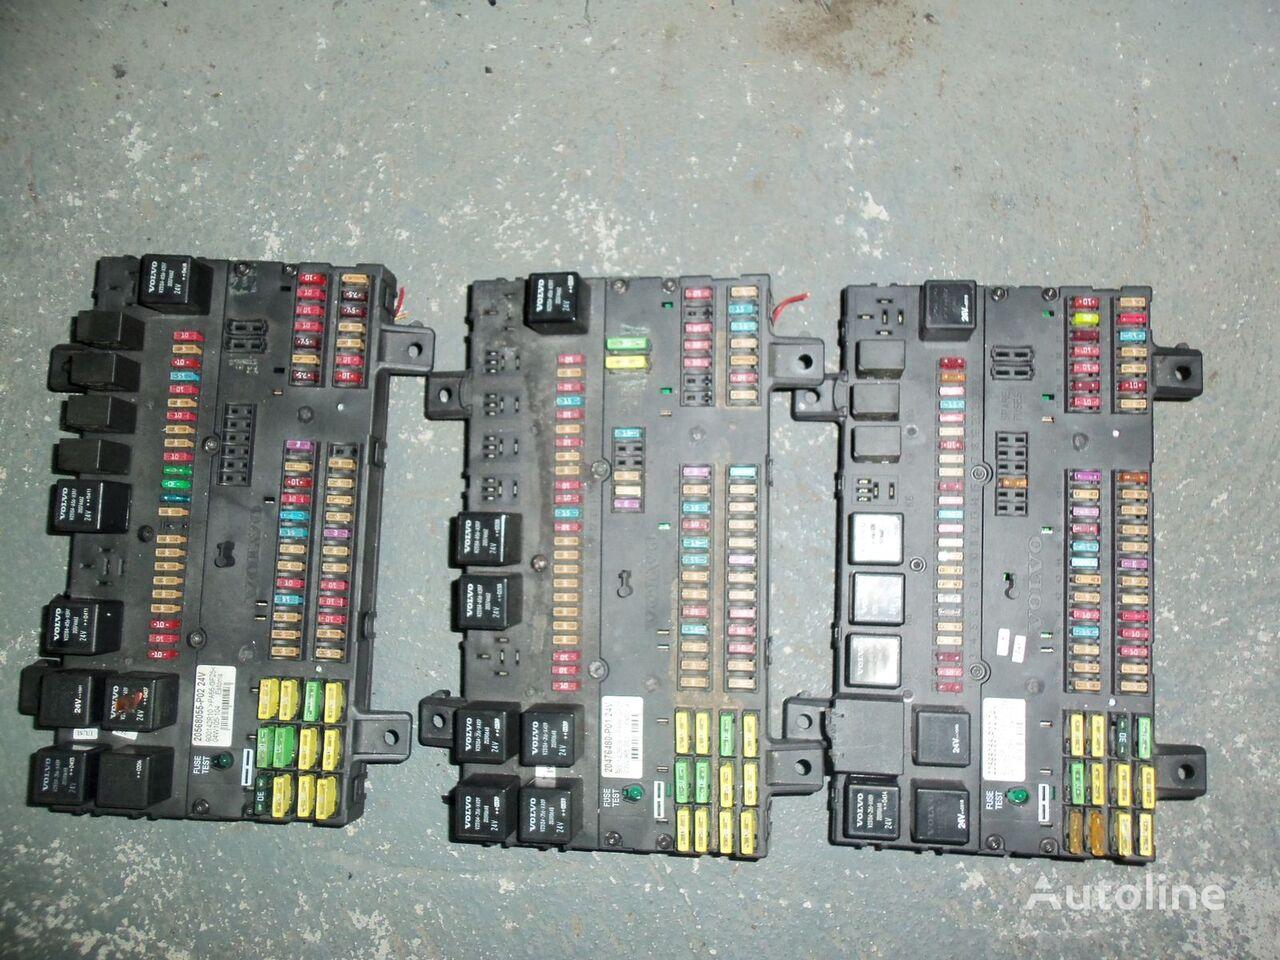 VOLVO FH13 tır için VOLVO FH13 fuse and relay center, central electrical box 20568055, 21732199 emniyet kutusu